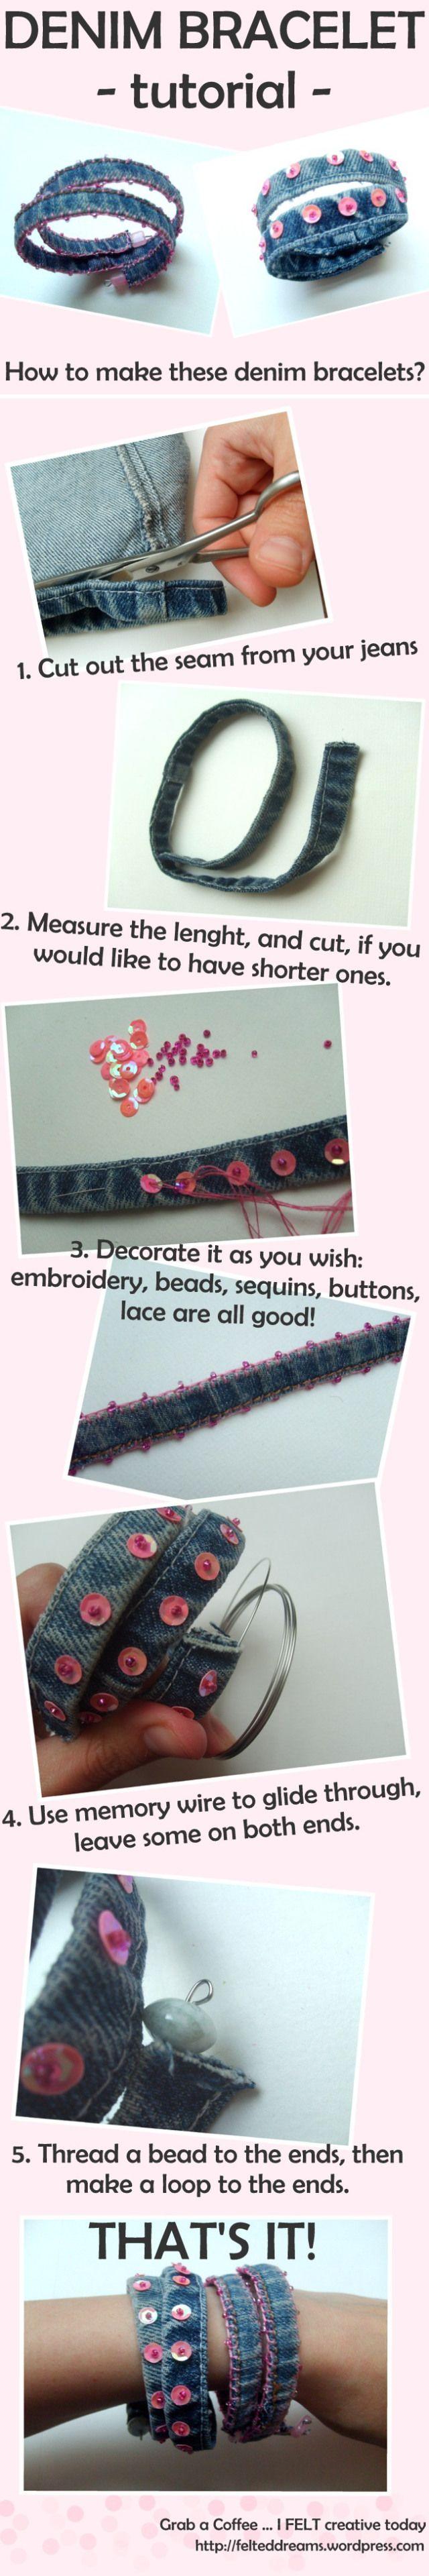 @: denim bracelet tutorial